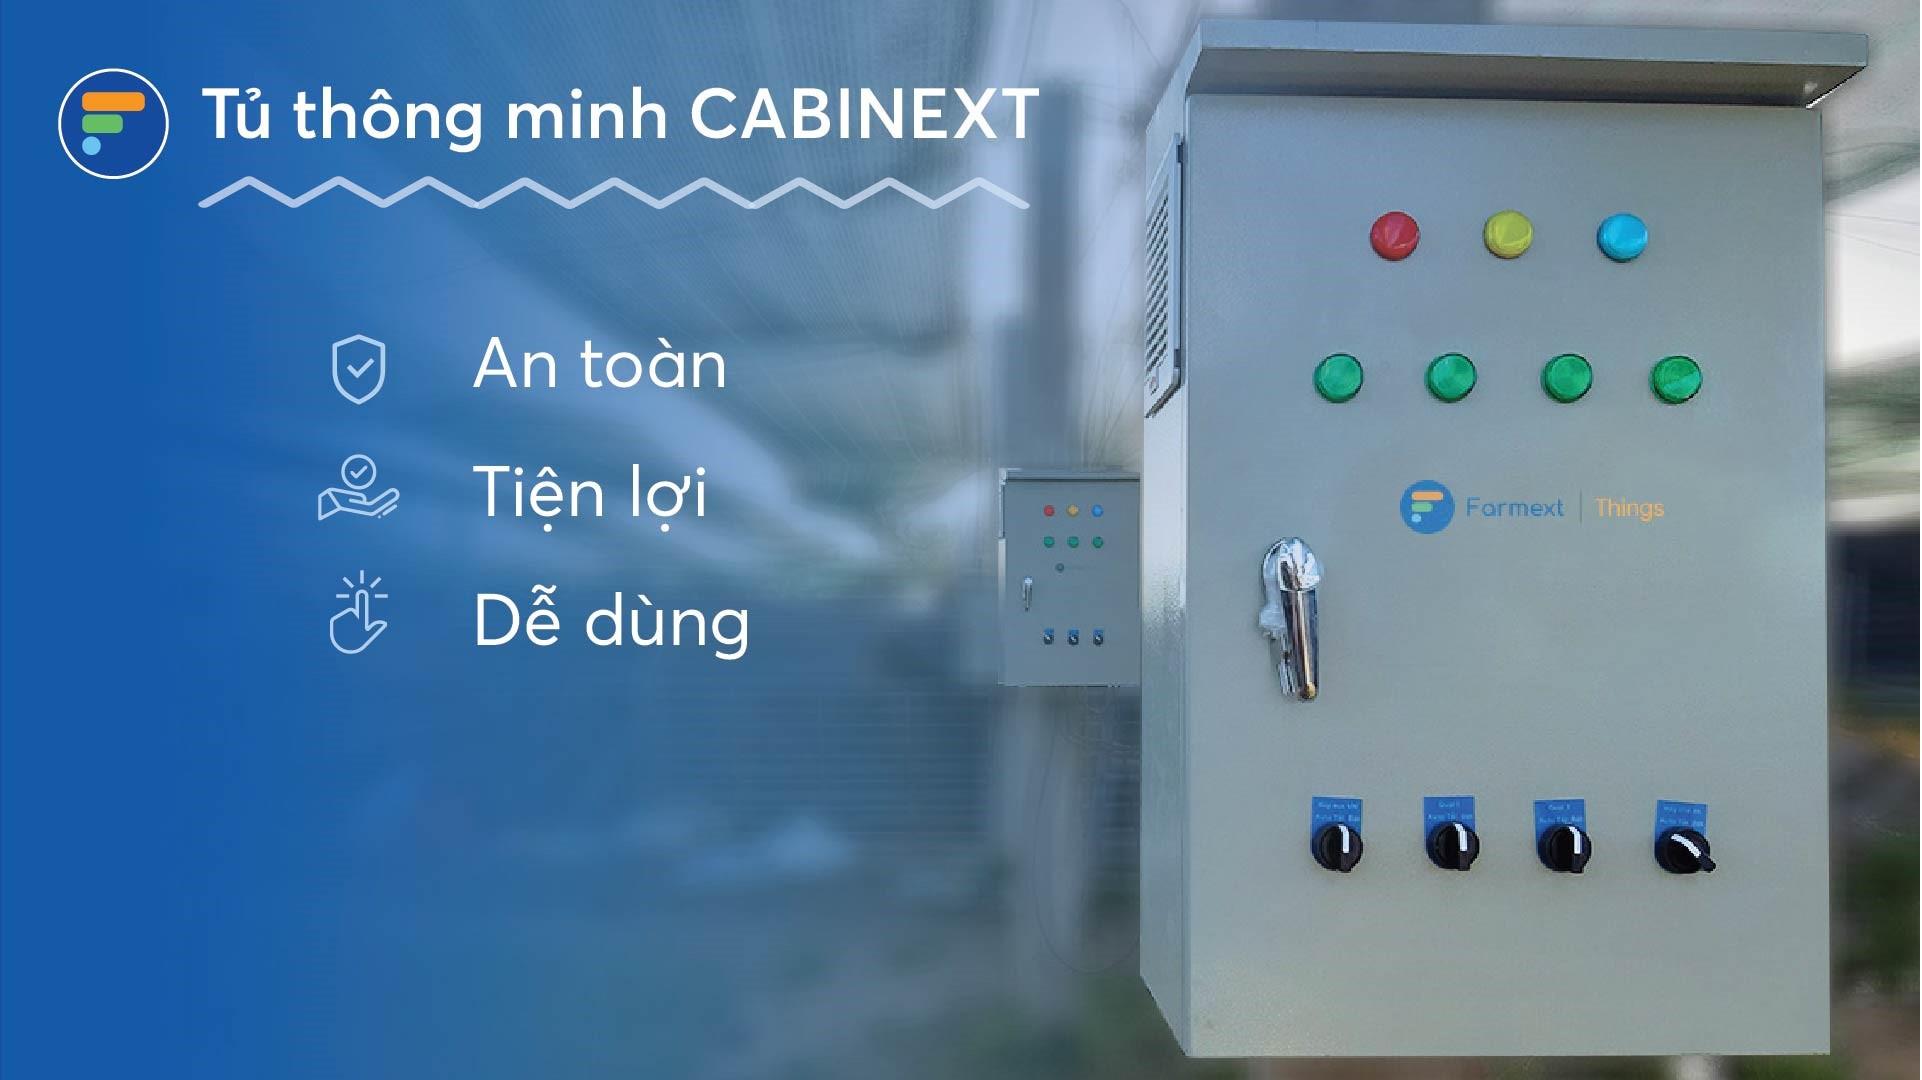 tủ điện cabinext